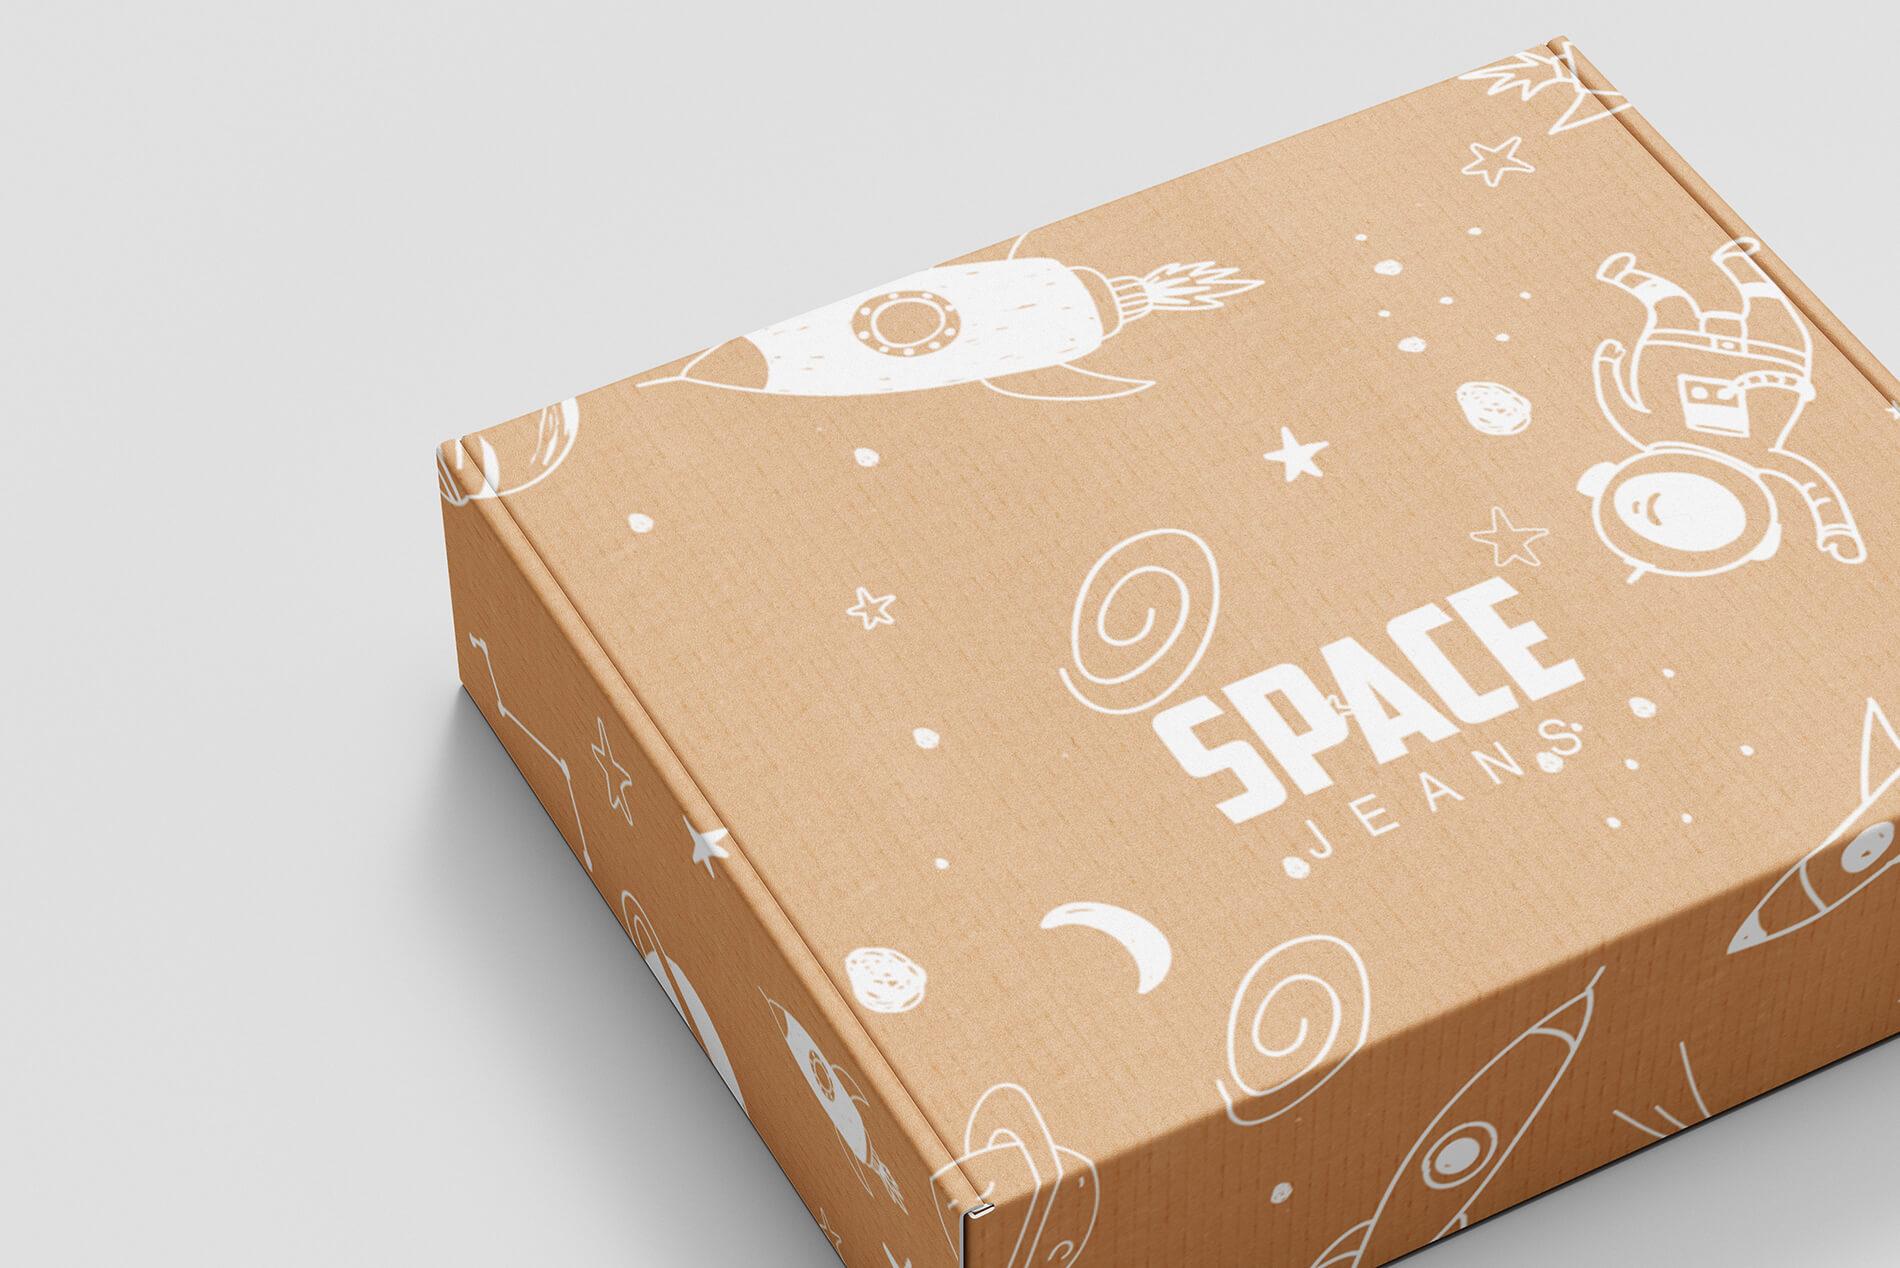 Ozel-kargo-kutusu+beyaz+baski